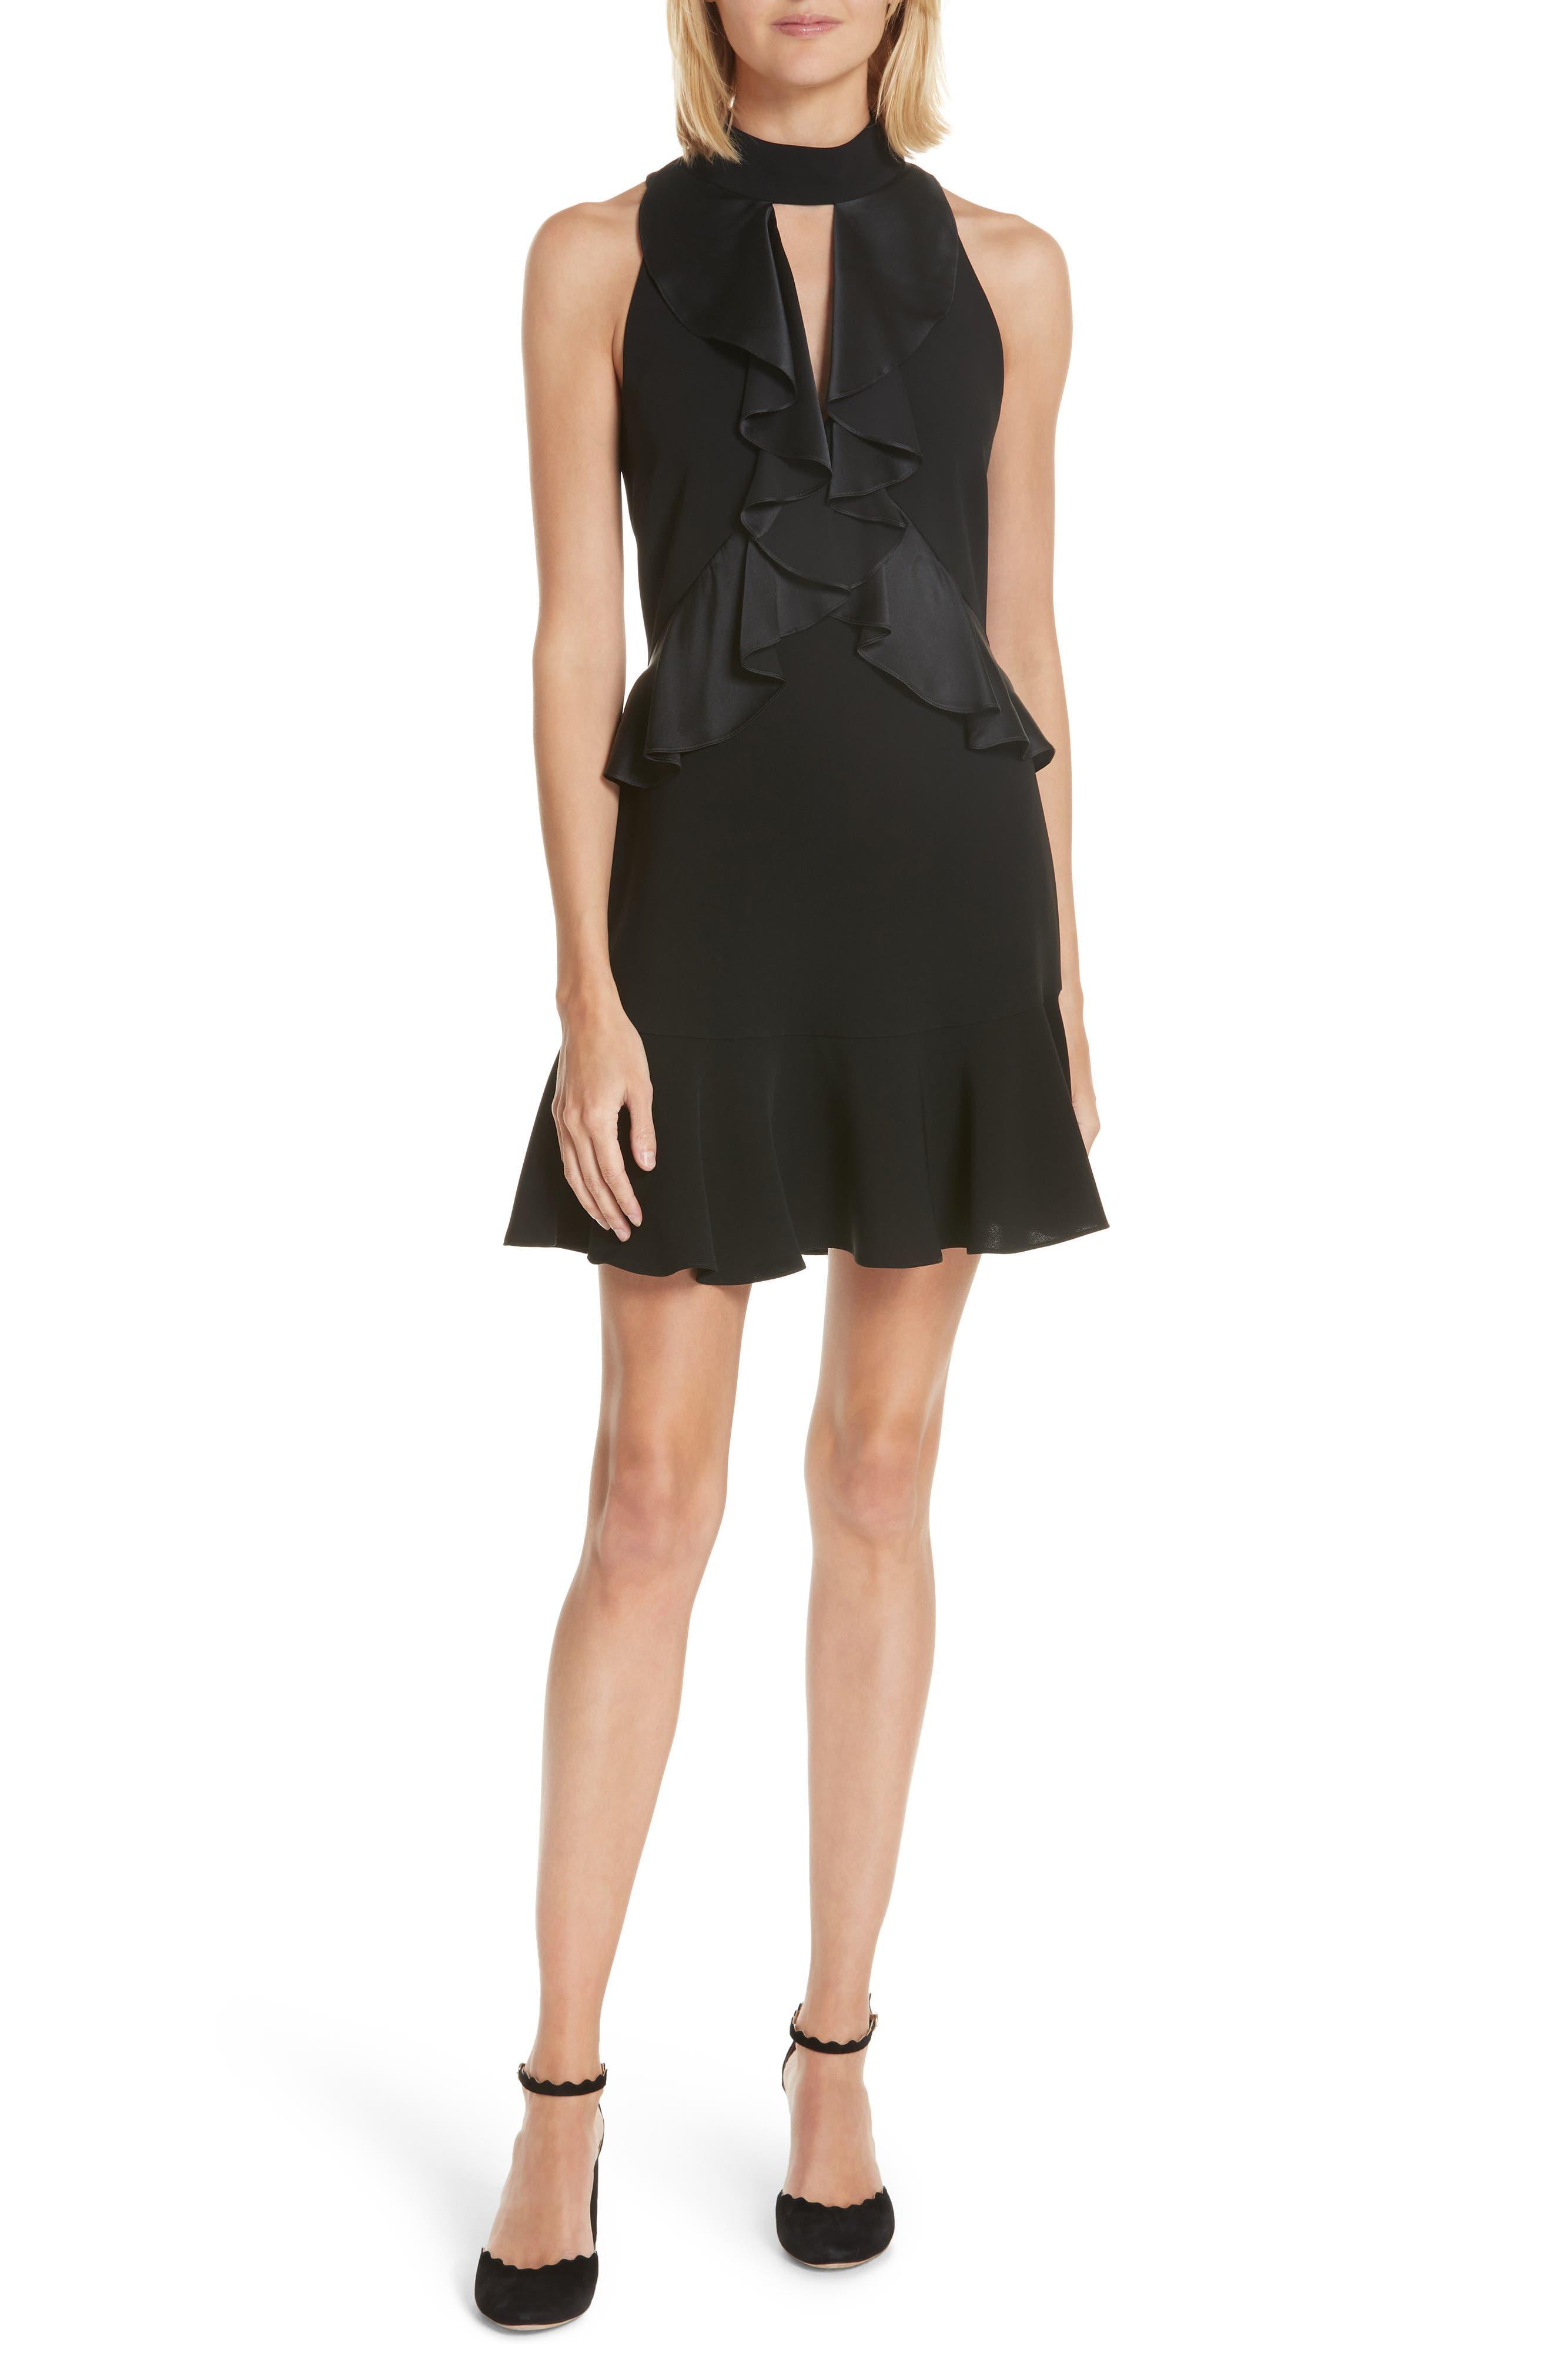 Alternate Image 1 Selected - Cinq à Sept Maxie Ruffle Dress